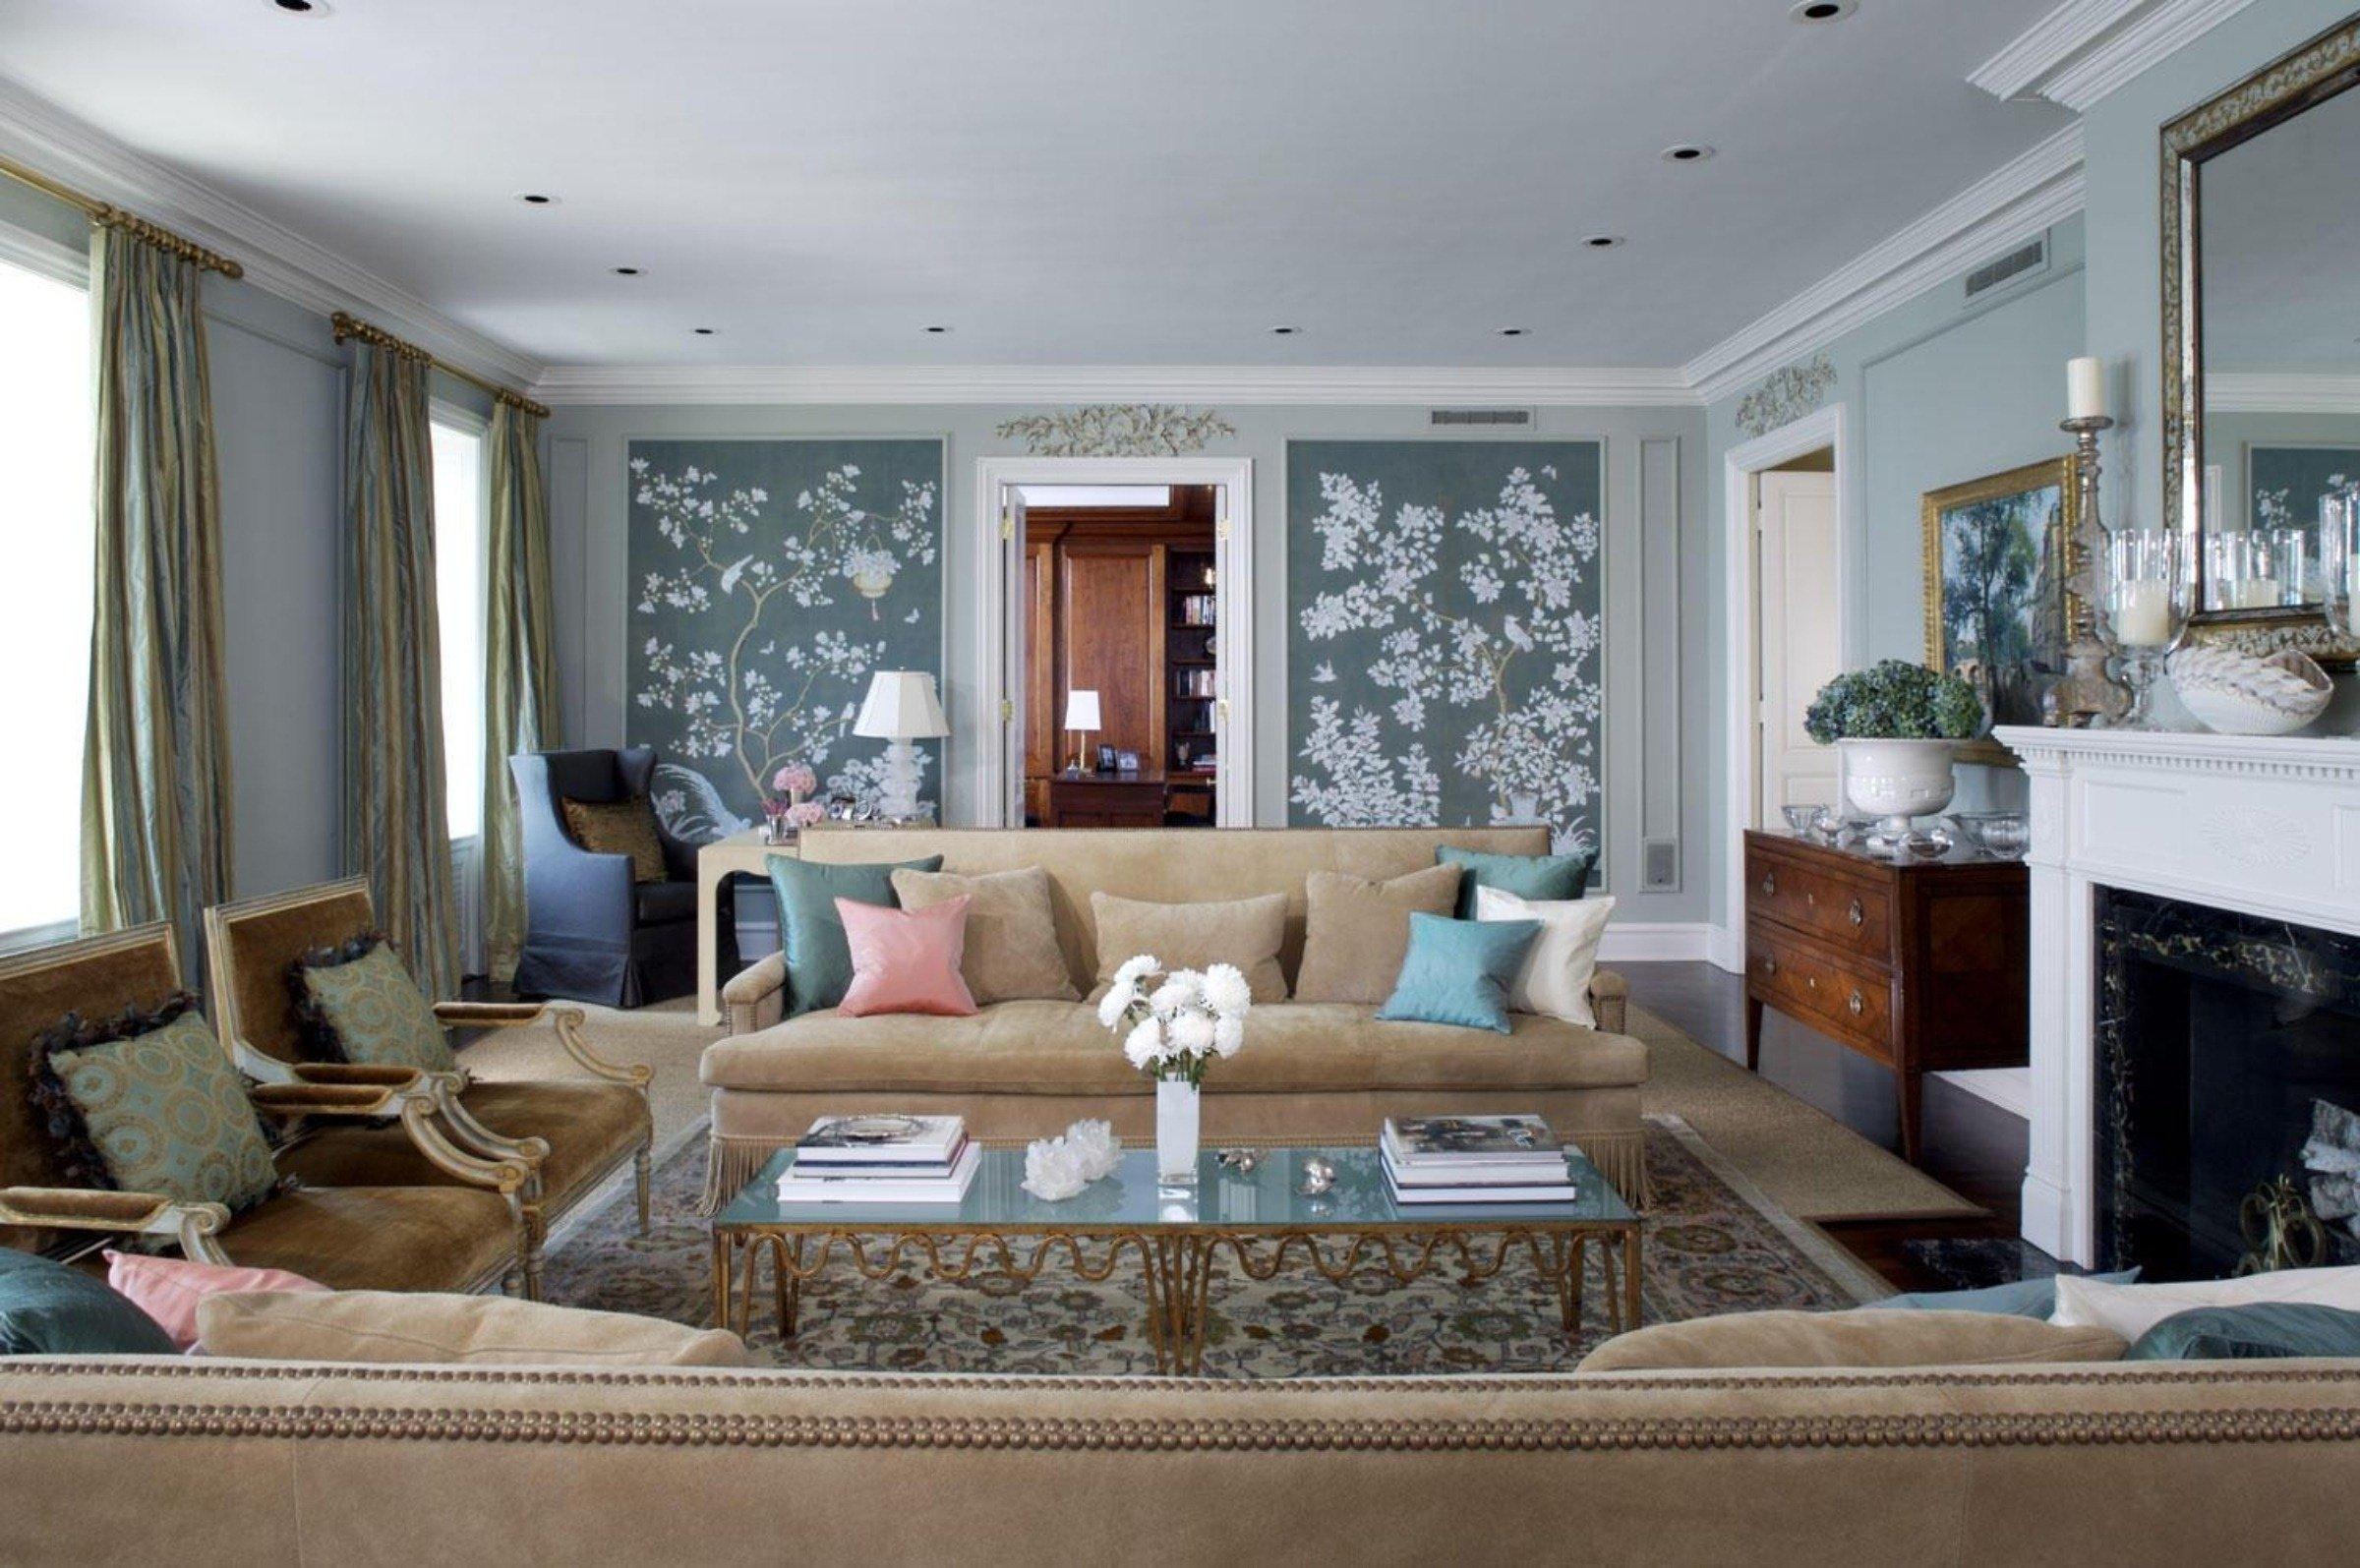 10 Elegant Large Living Room Design Ideas large wall decor for living room yoadvice 2021